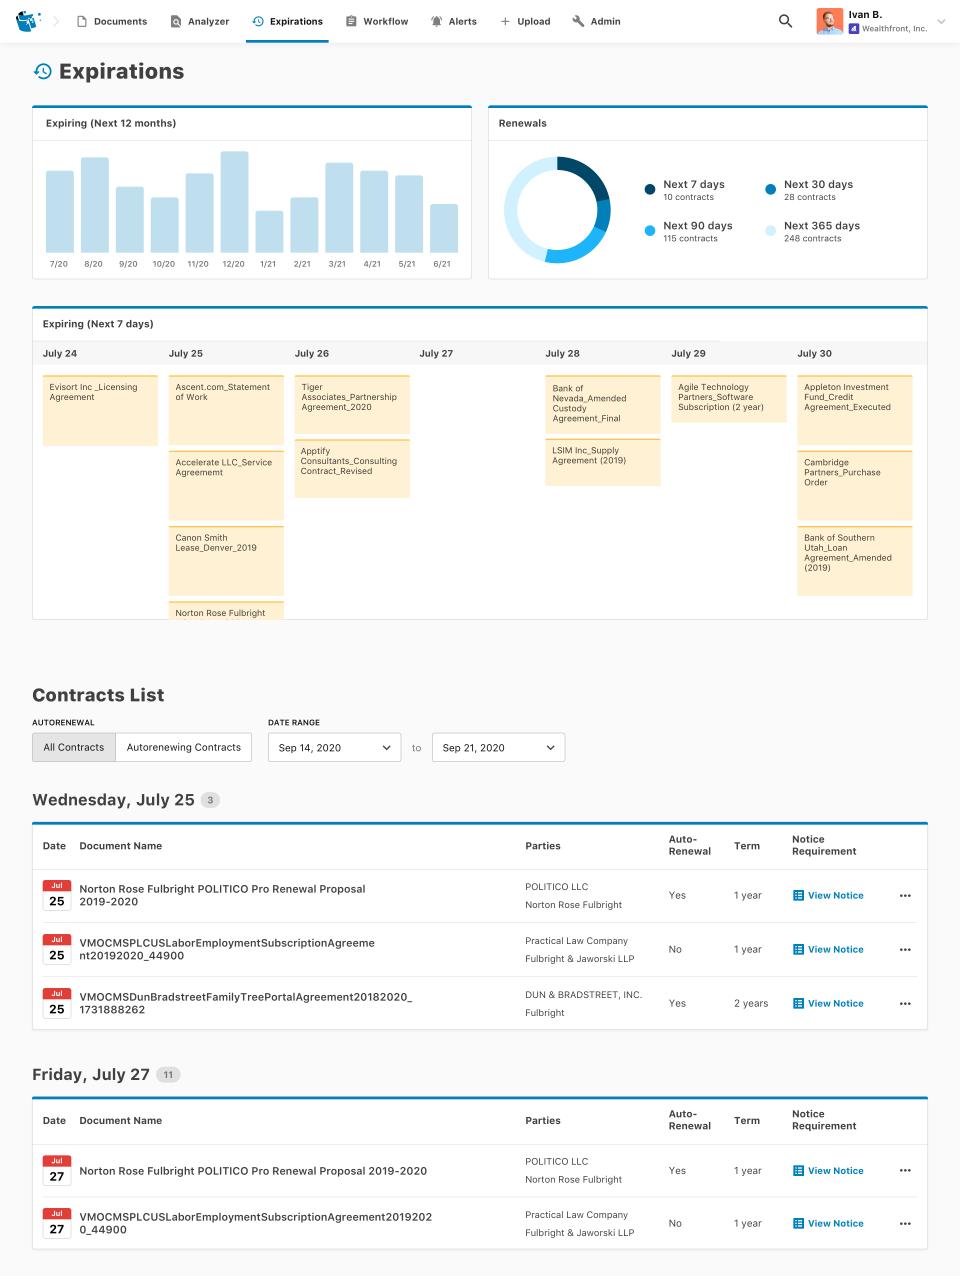 Evisort contract expirations tracker